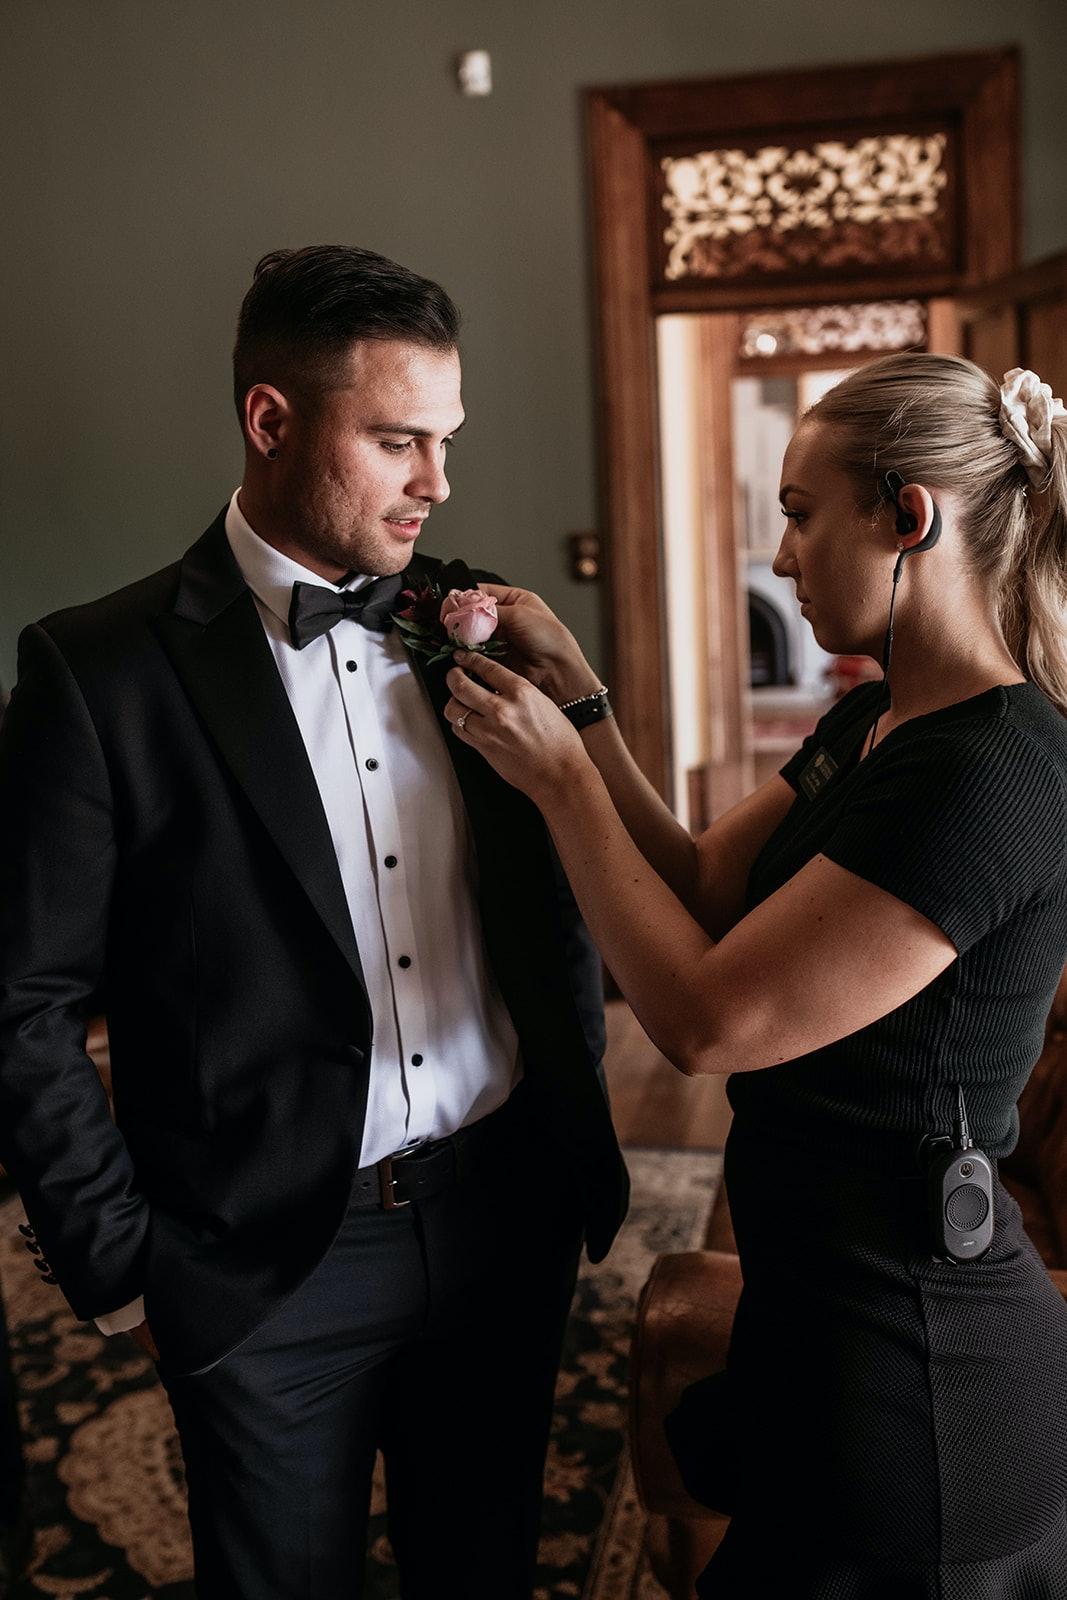 wedding planner adjusts buttonhole on groom